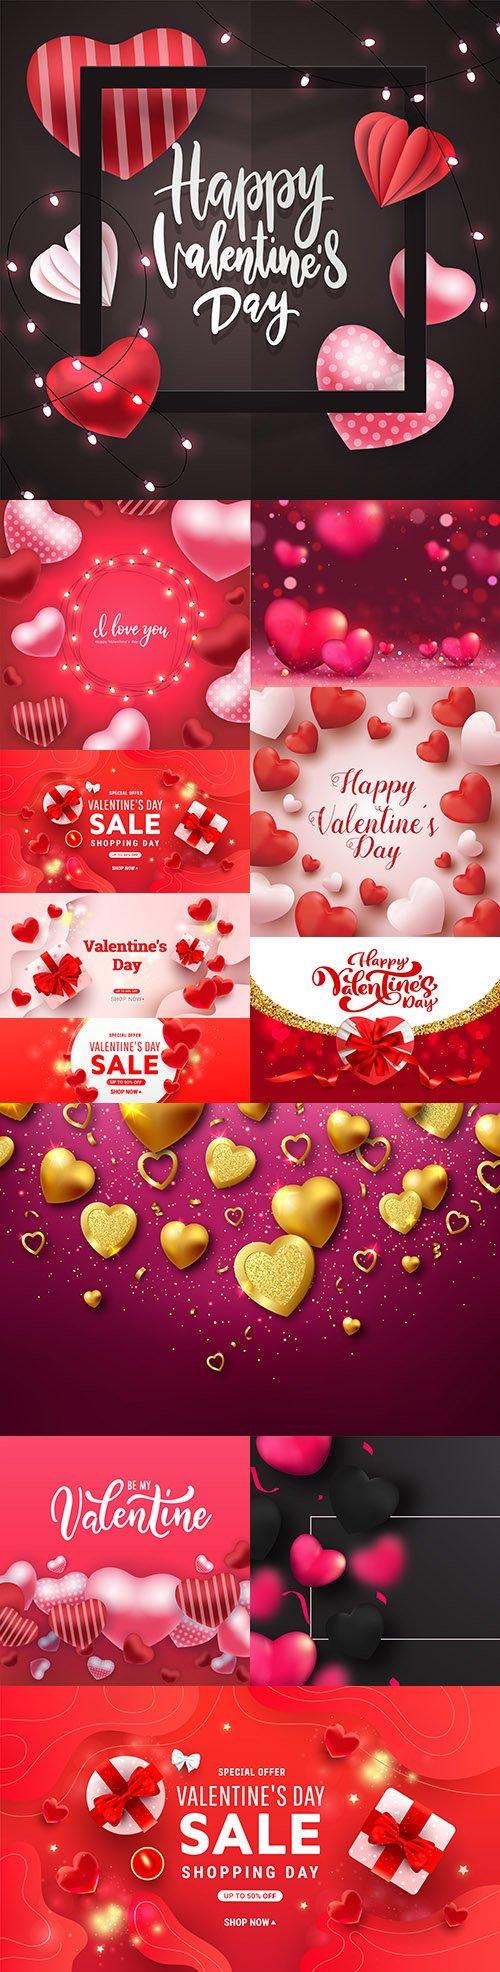 Valentine's Day romantic elements decorative illustrations 15